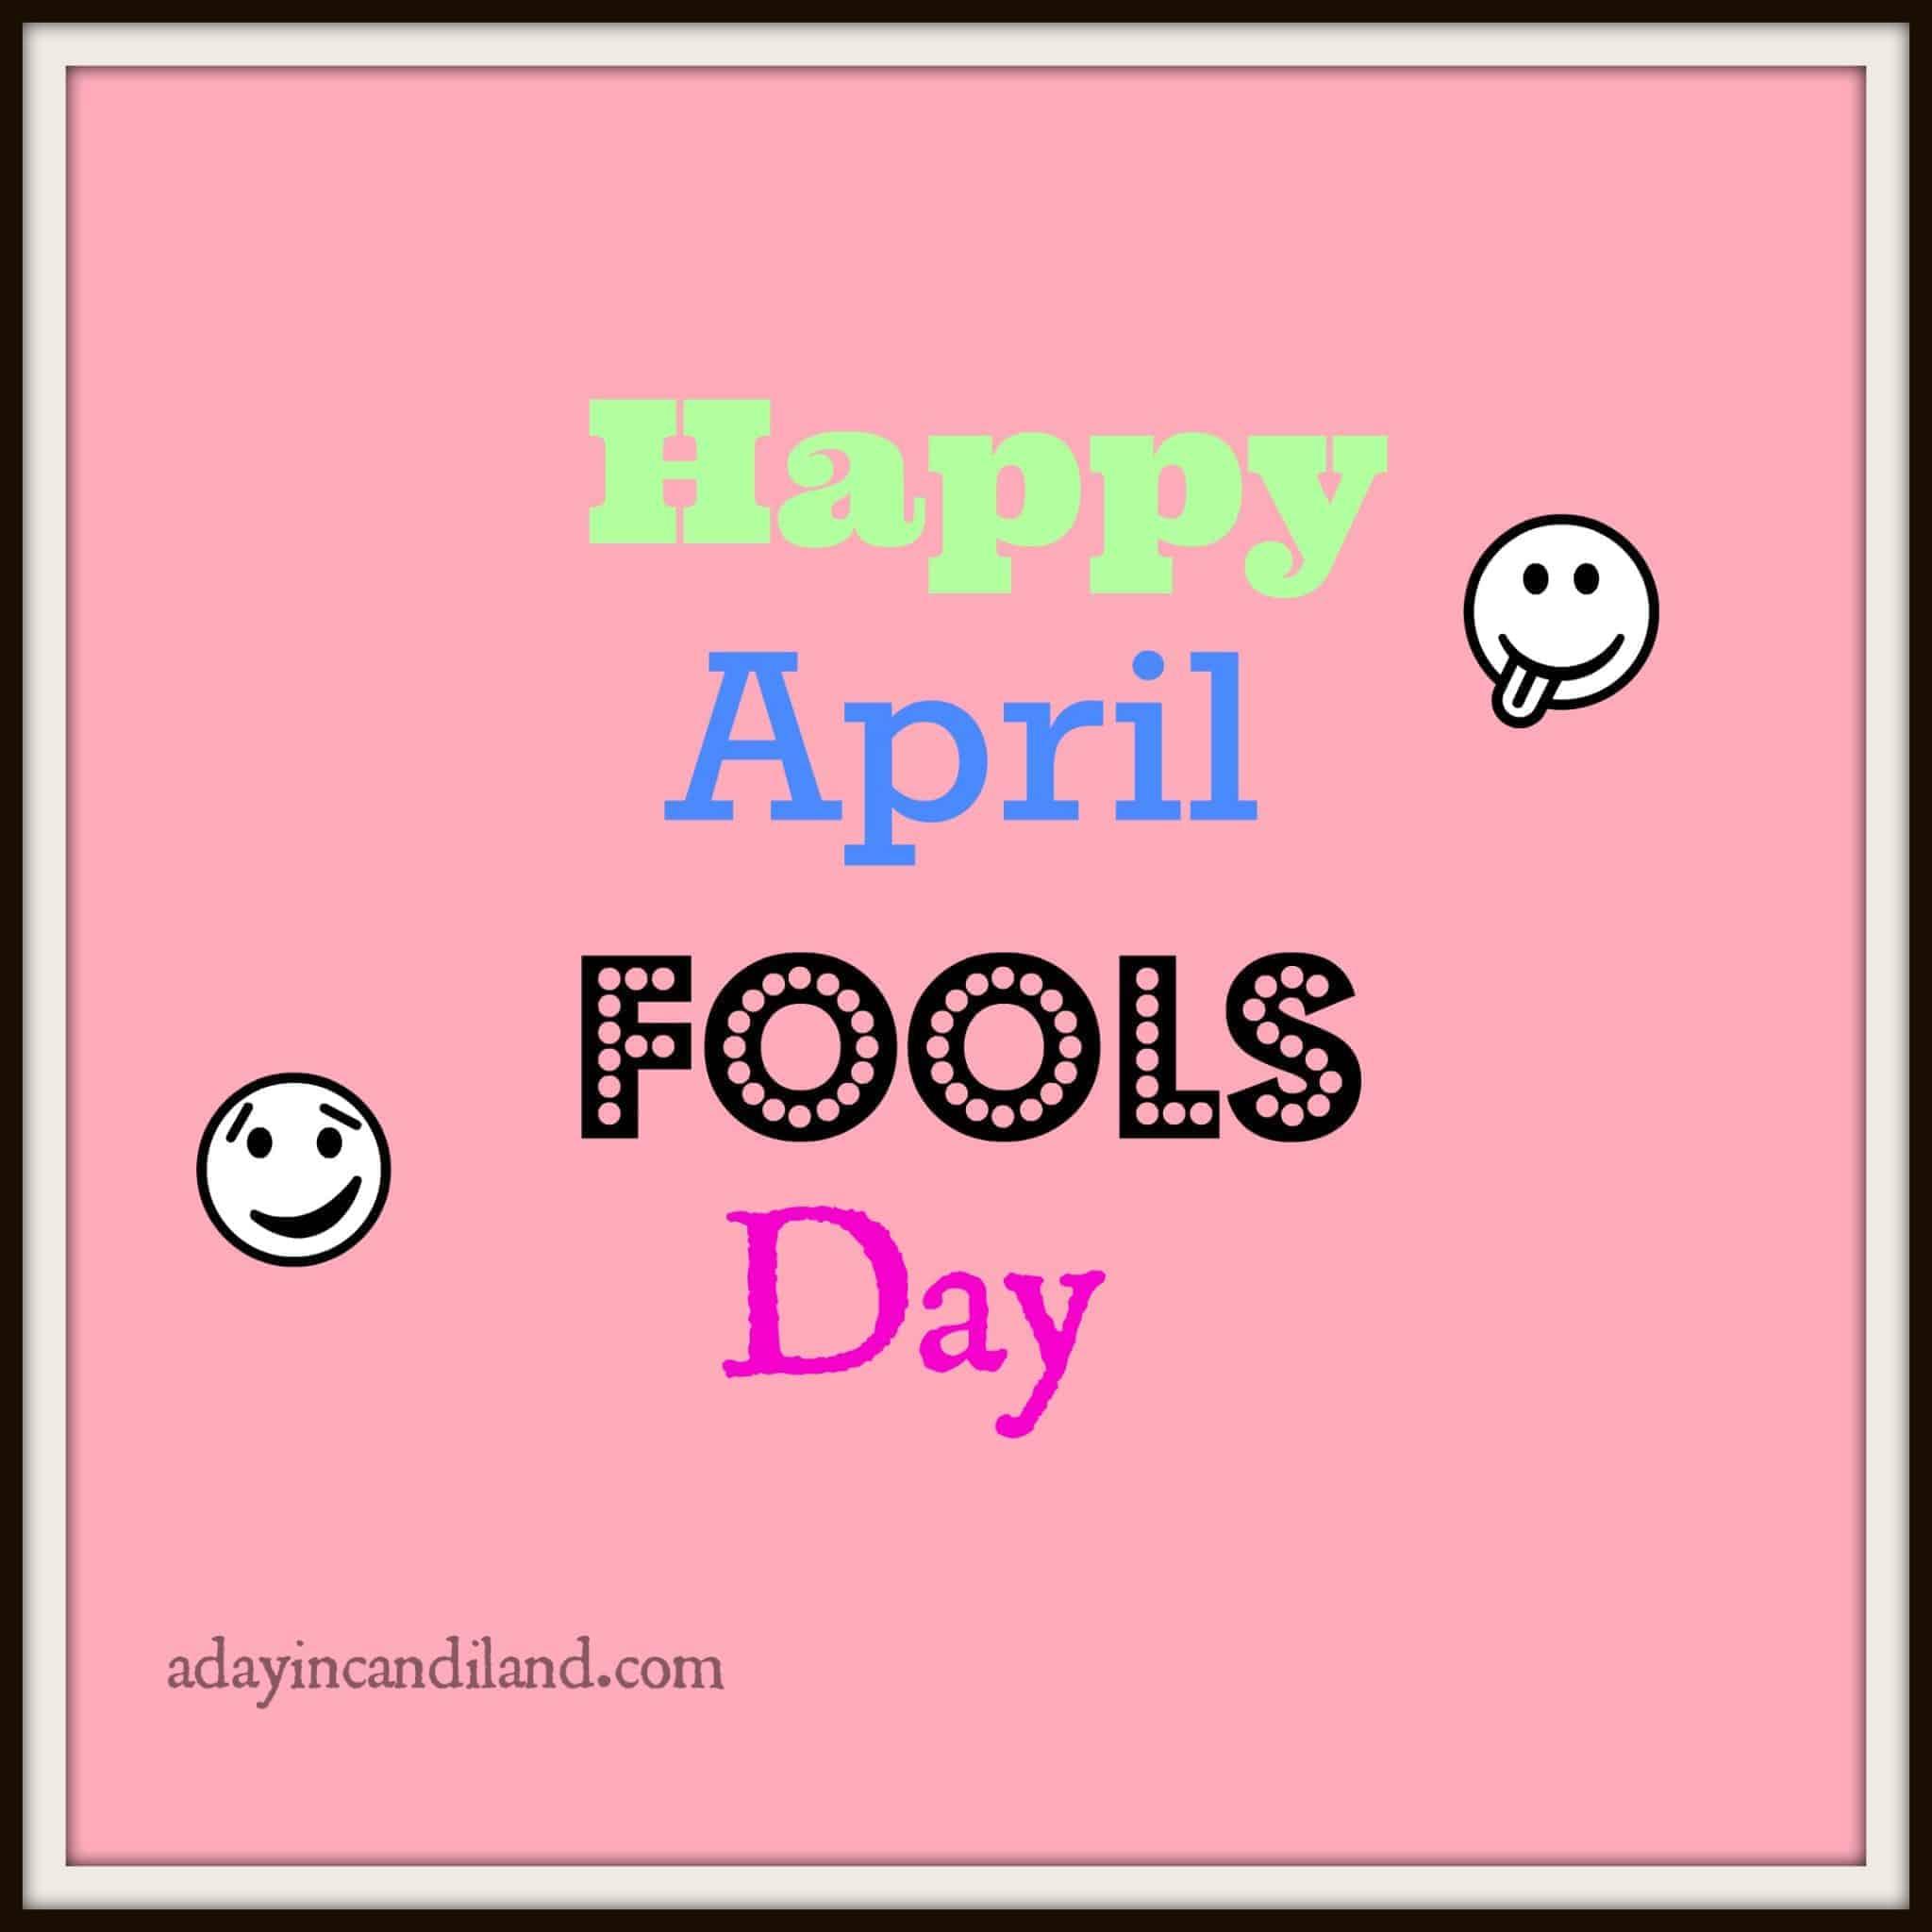 Greatest April Fools Pranks